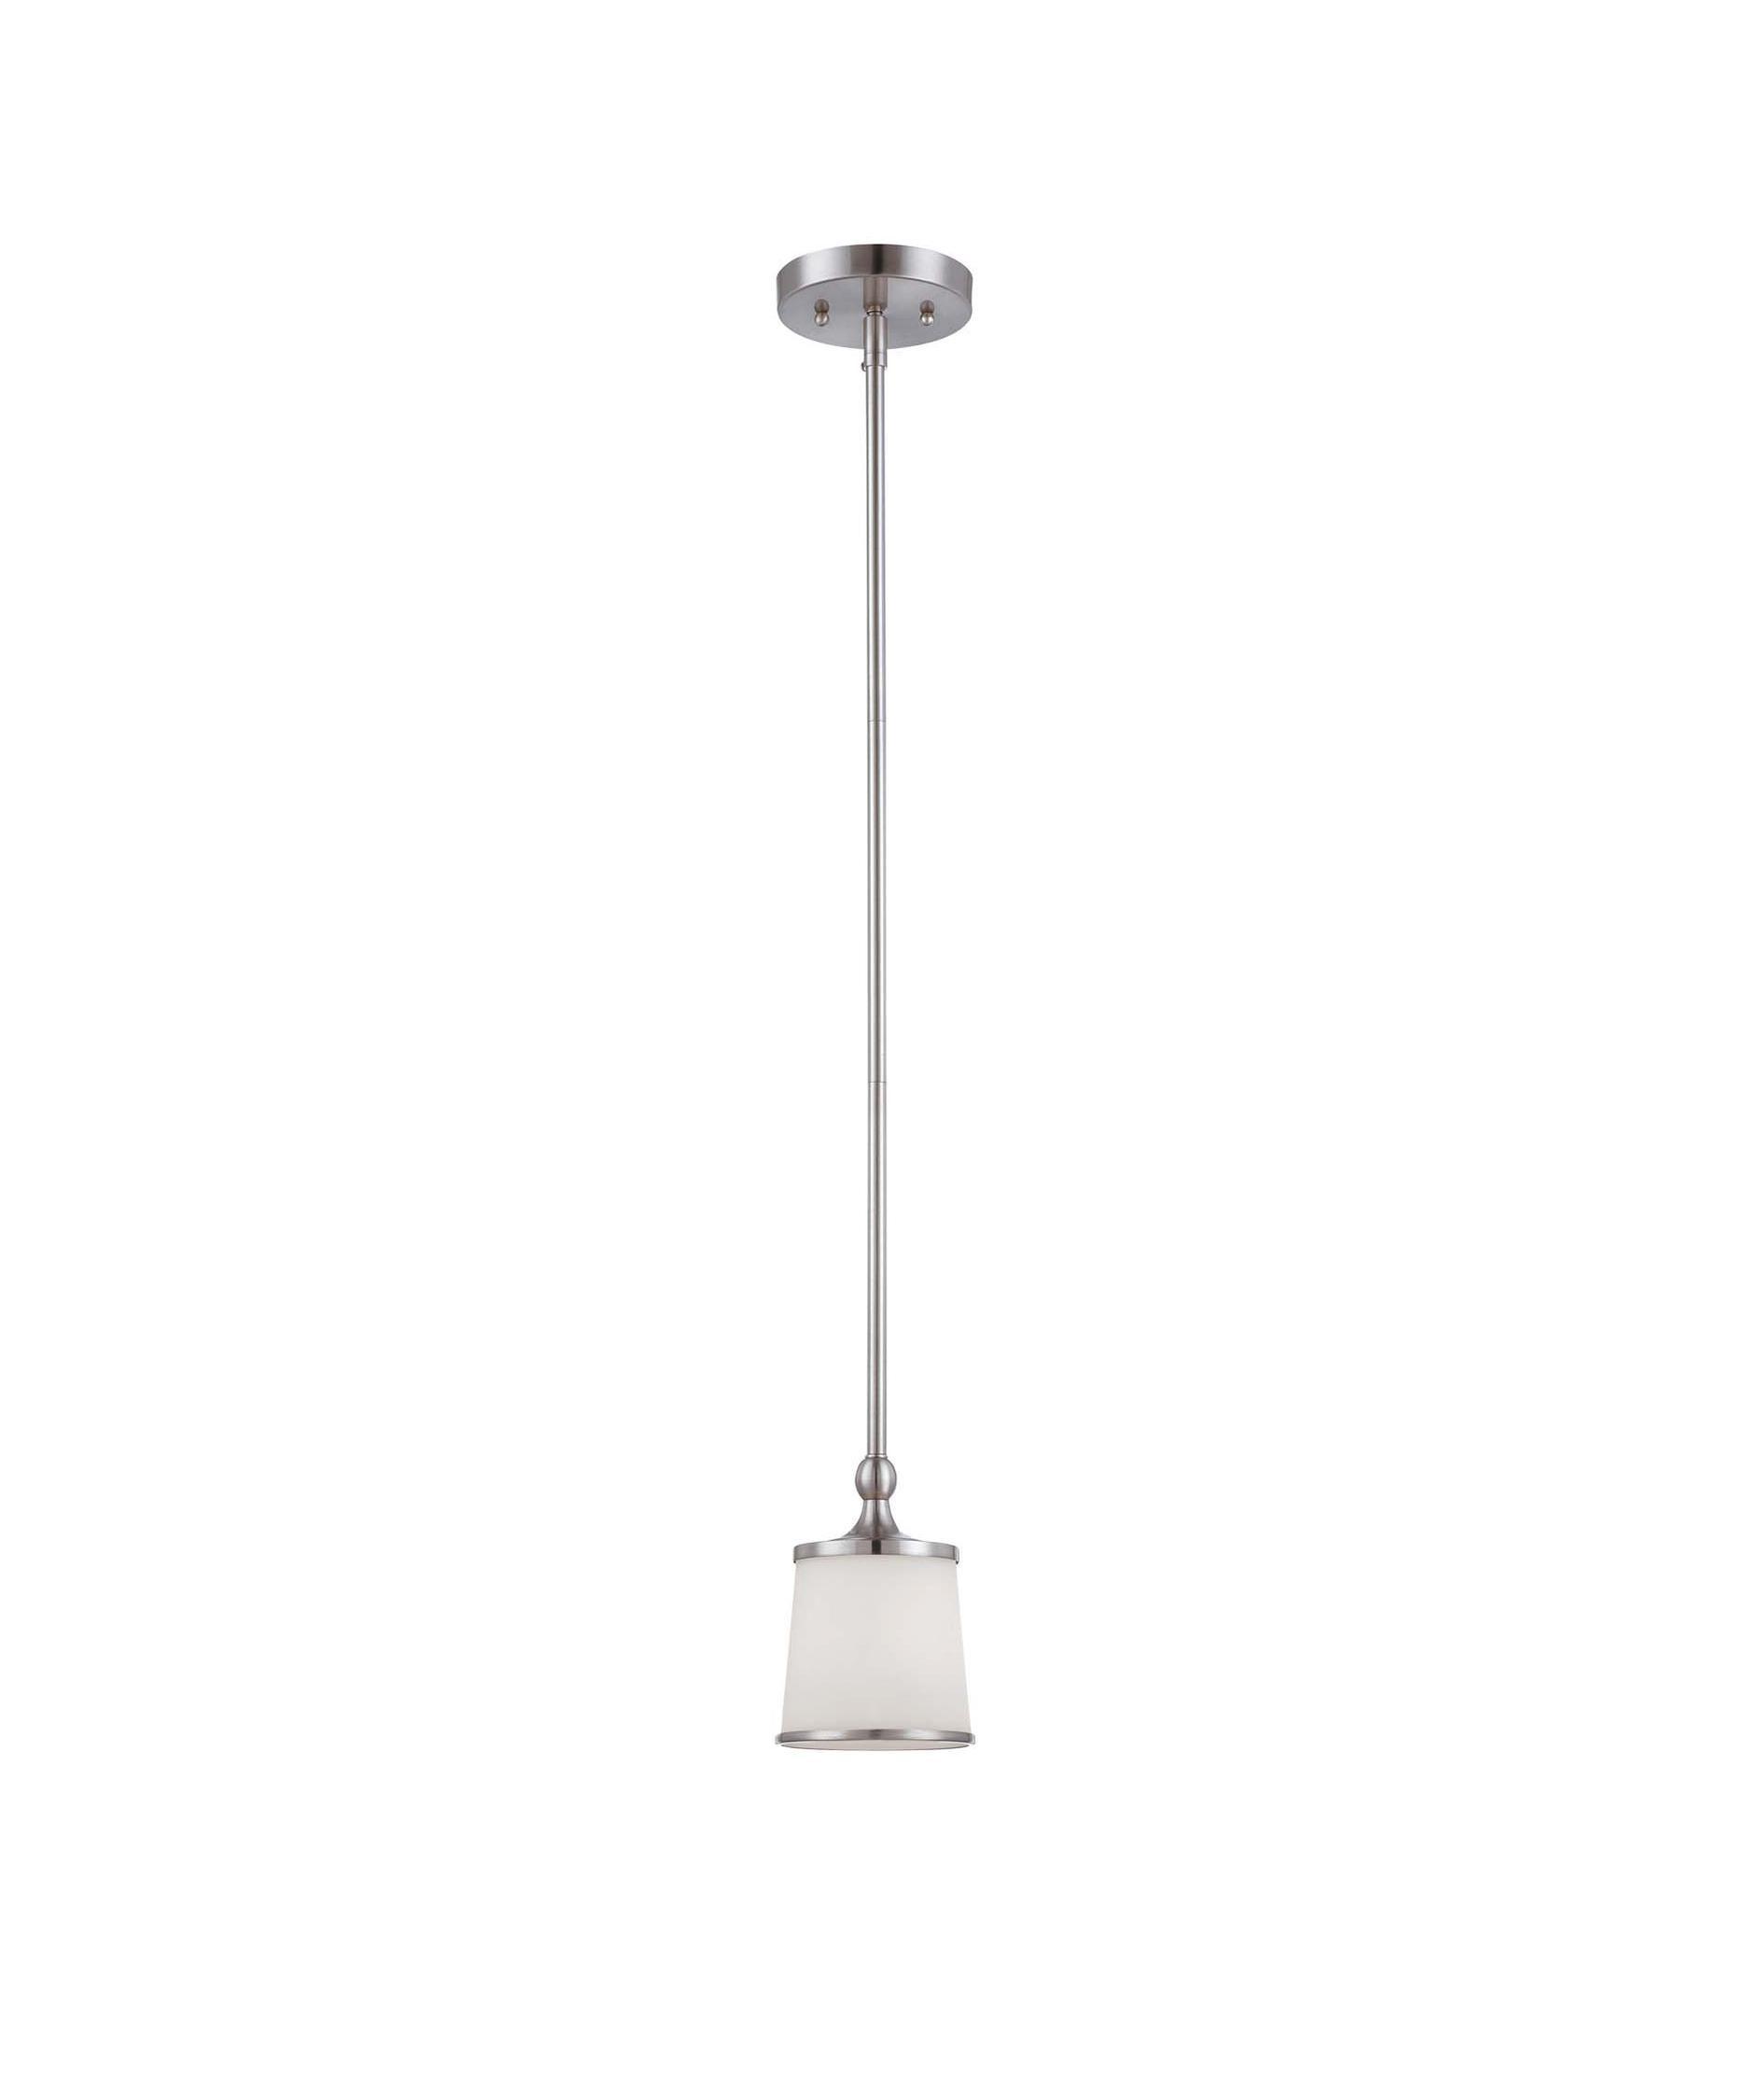 Savoy house hagen inch mini pendant lighting